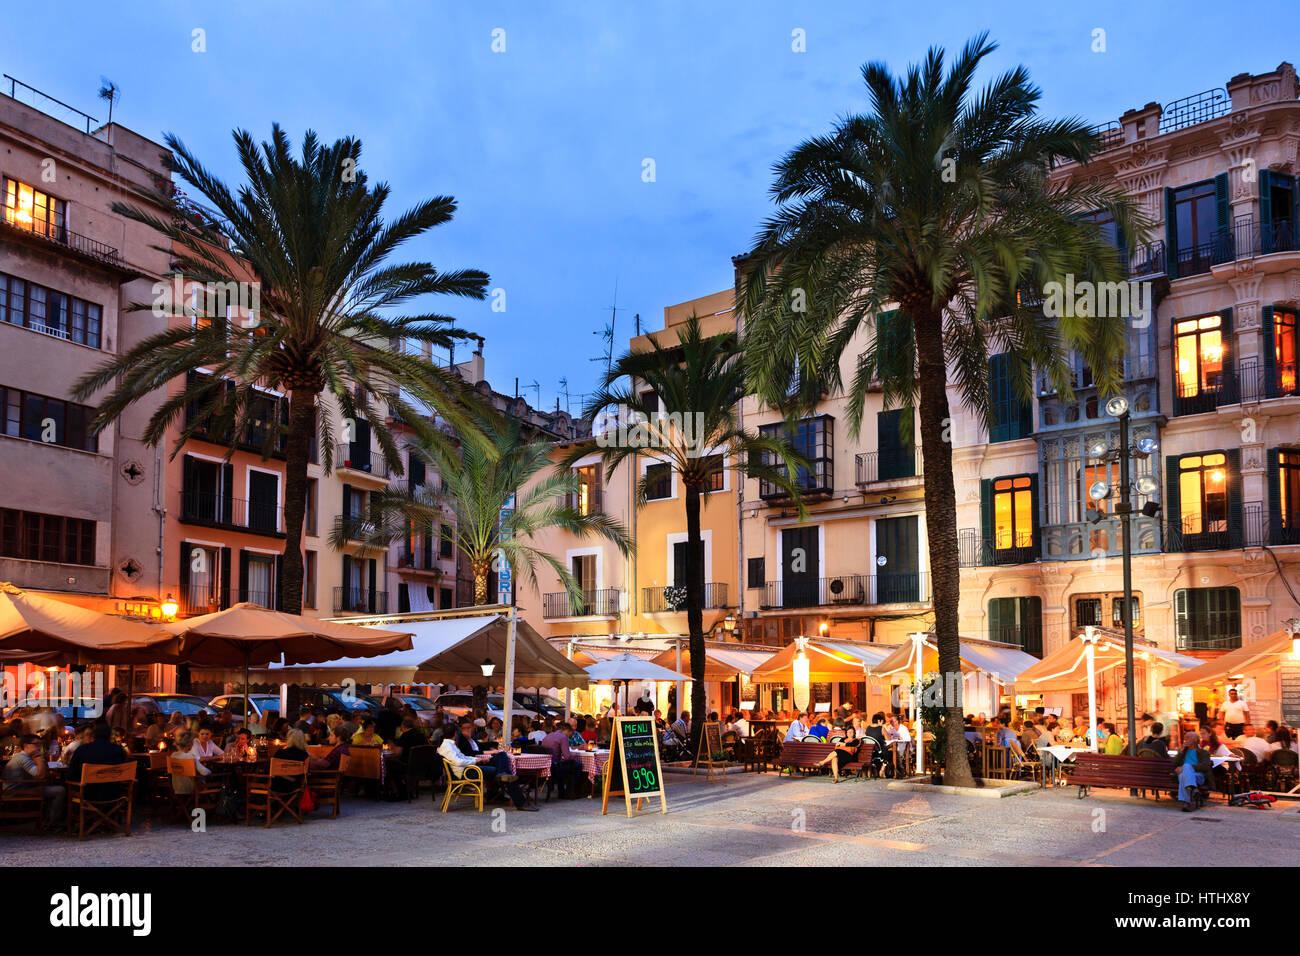 Placa de la Llotja, Palma, Mallorca, Spain Stock Photo